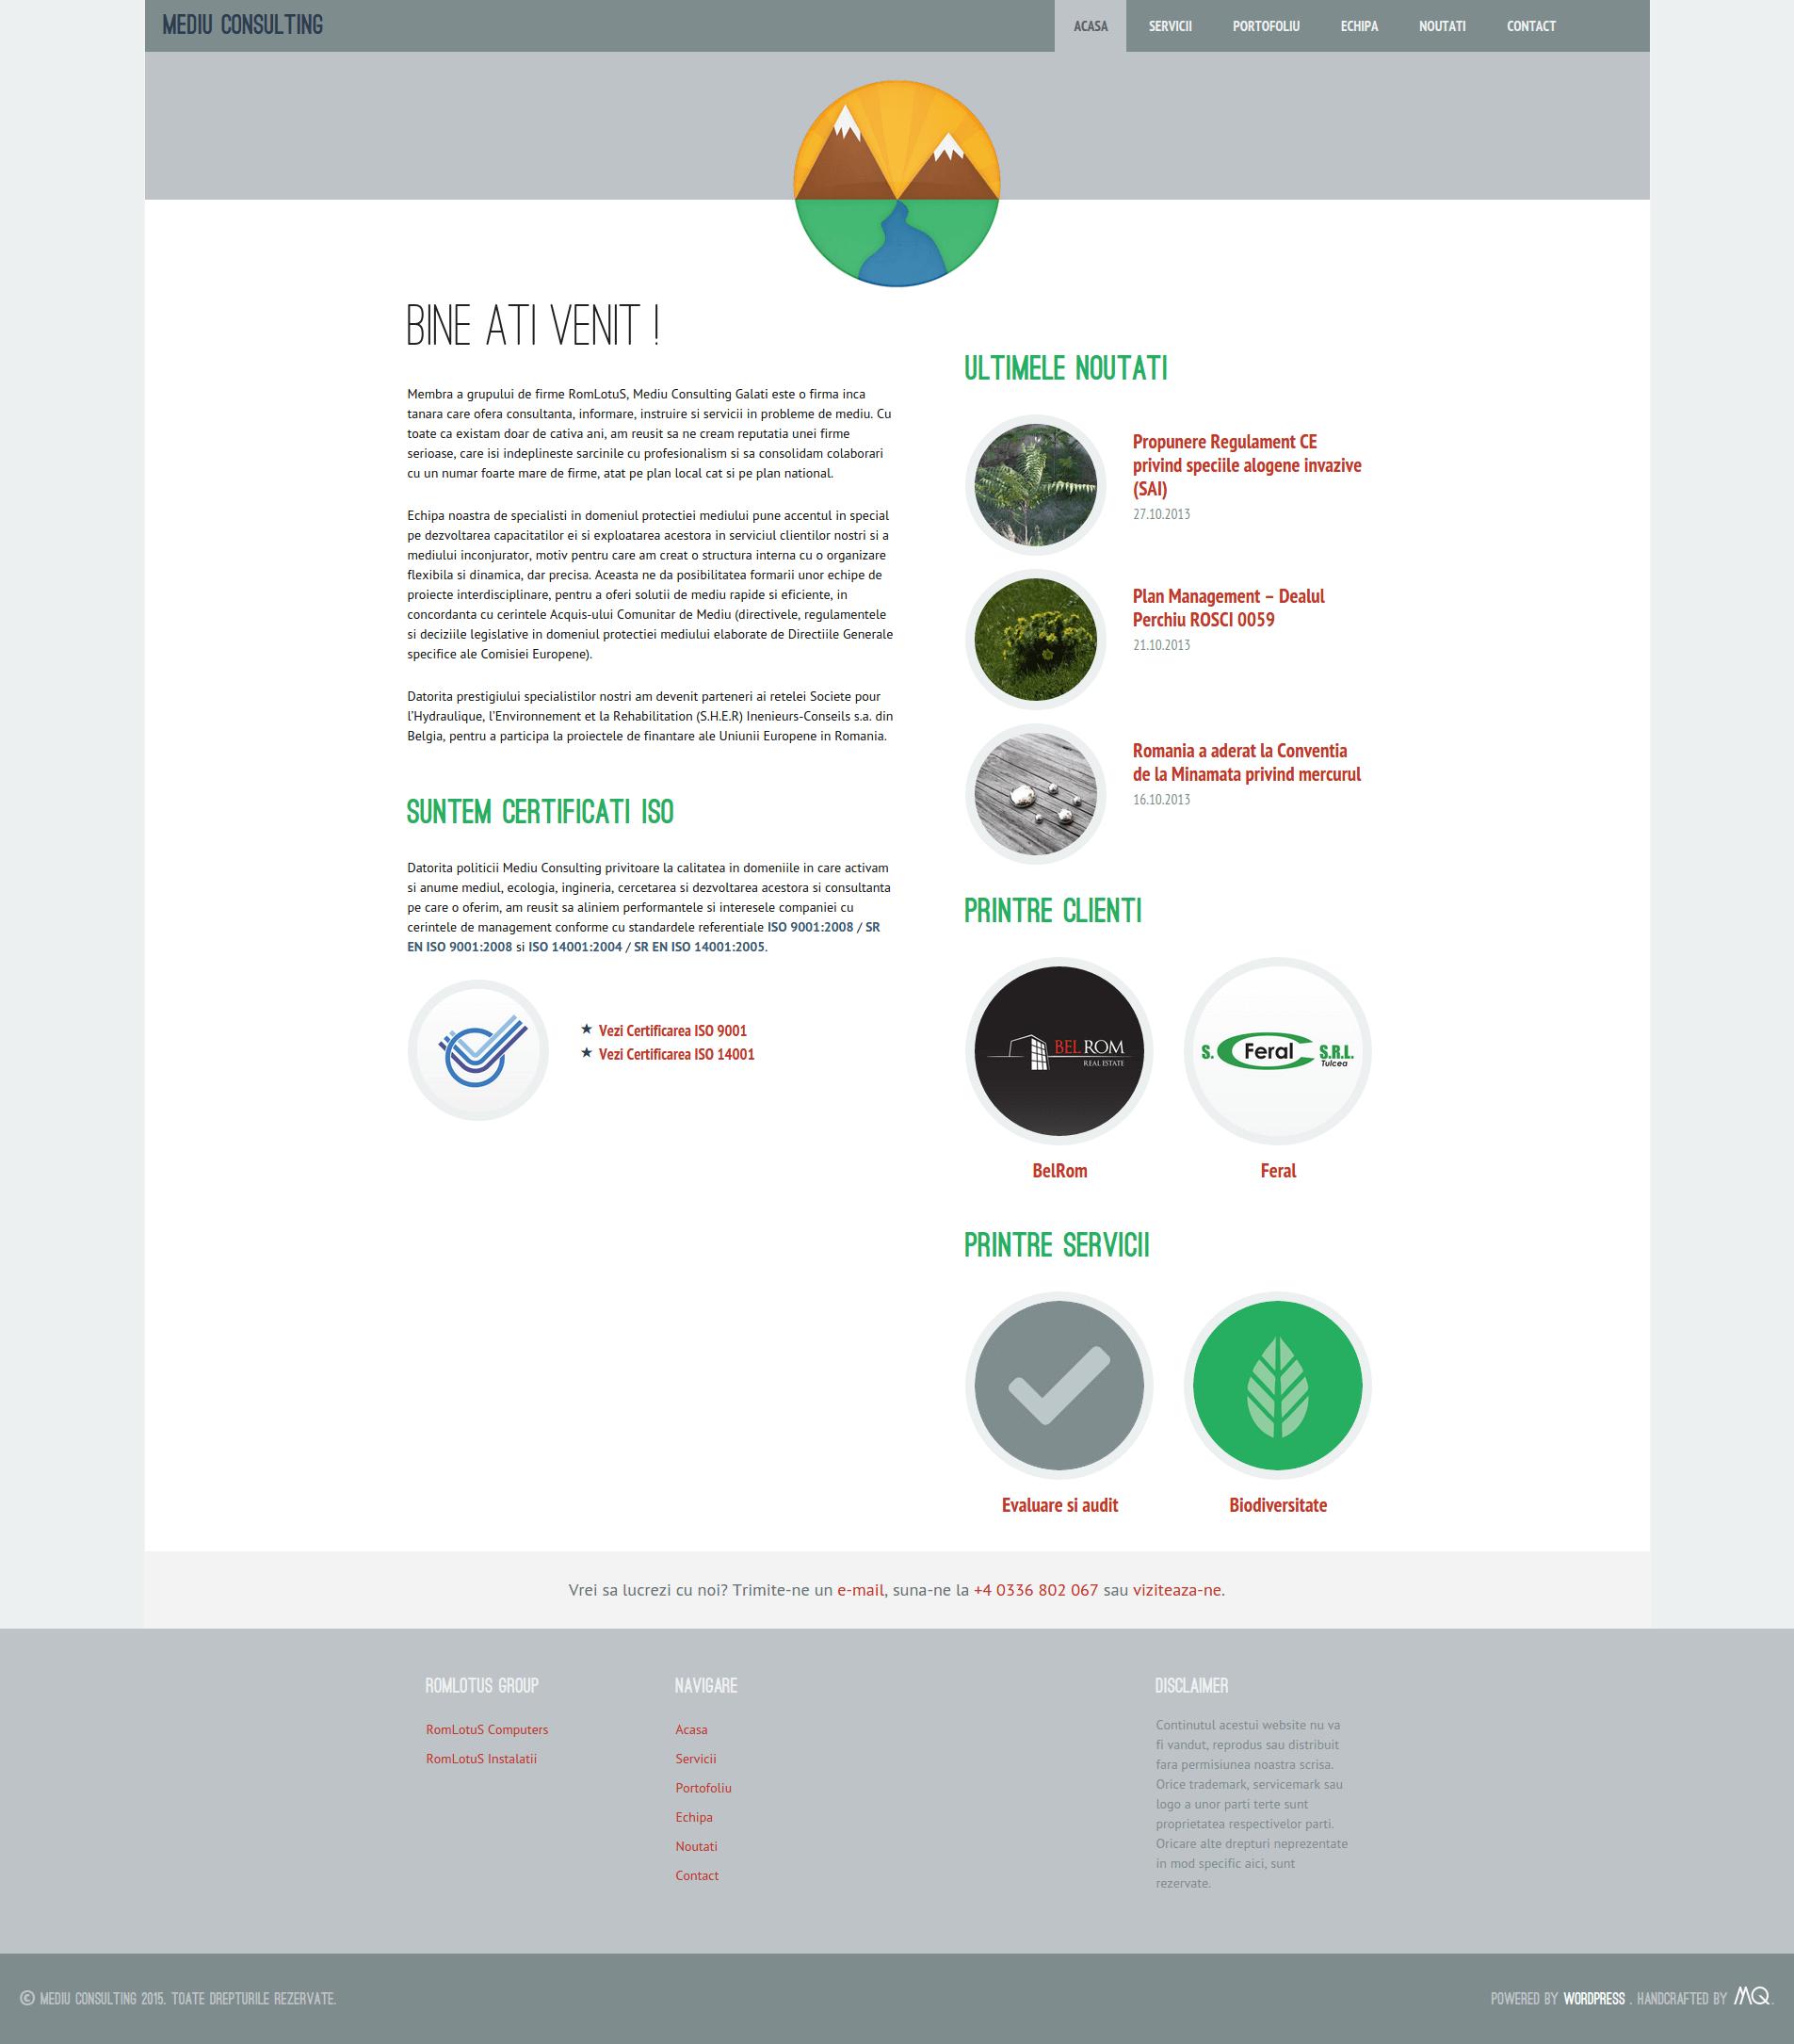 Desktop Screenshot of Mediu Consulting's Website